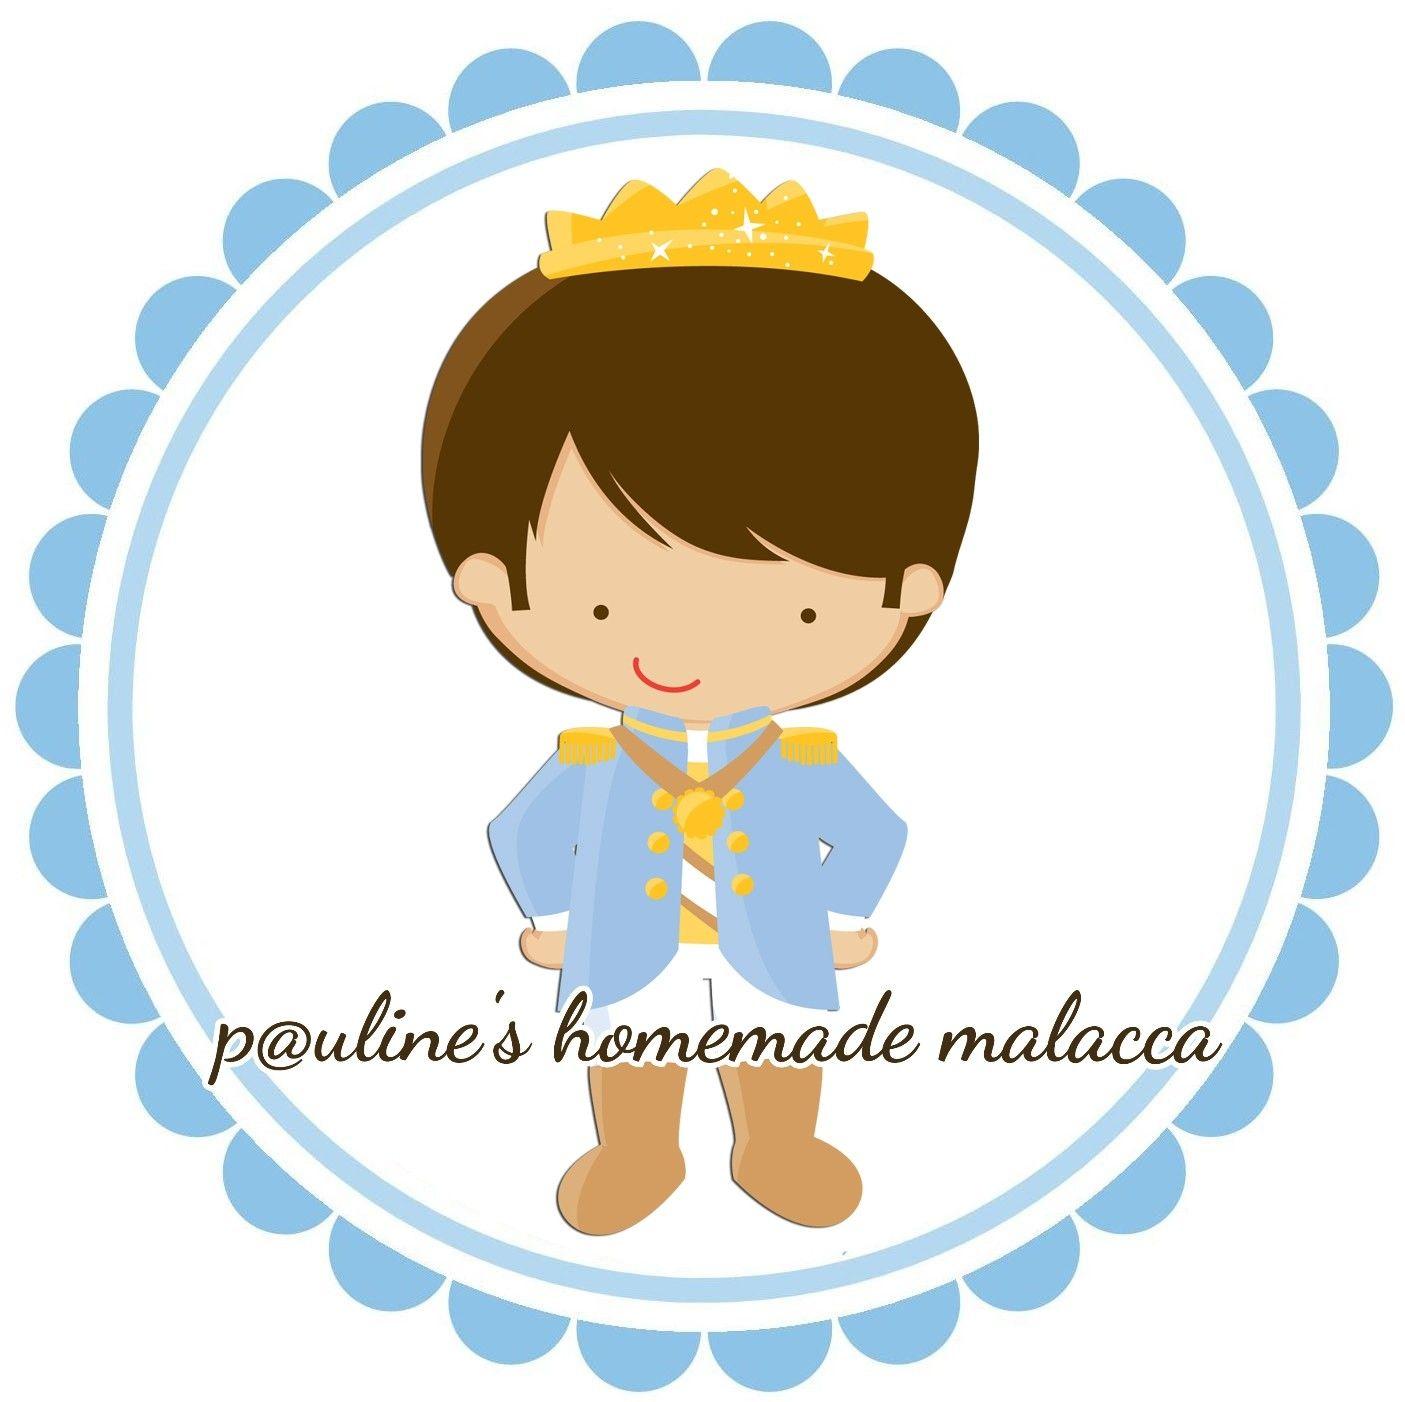 Little Prince Paulineshomemademalacca